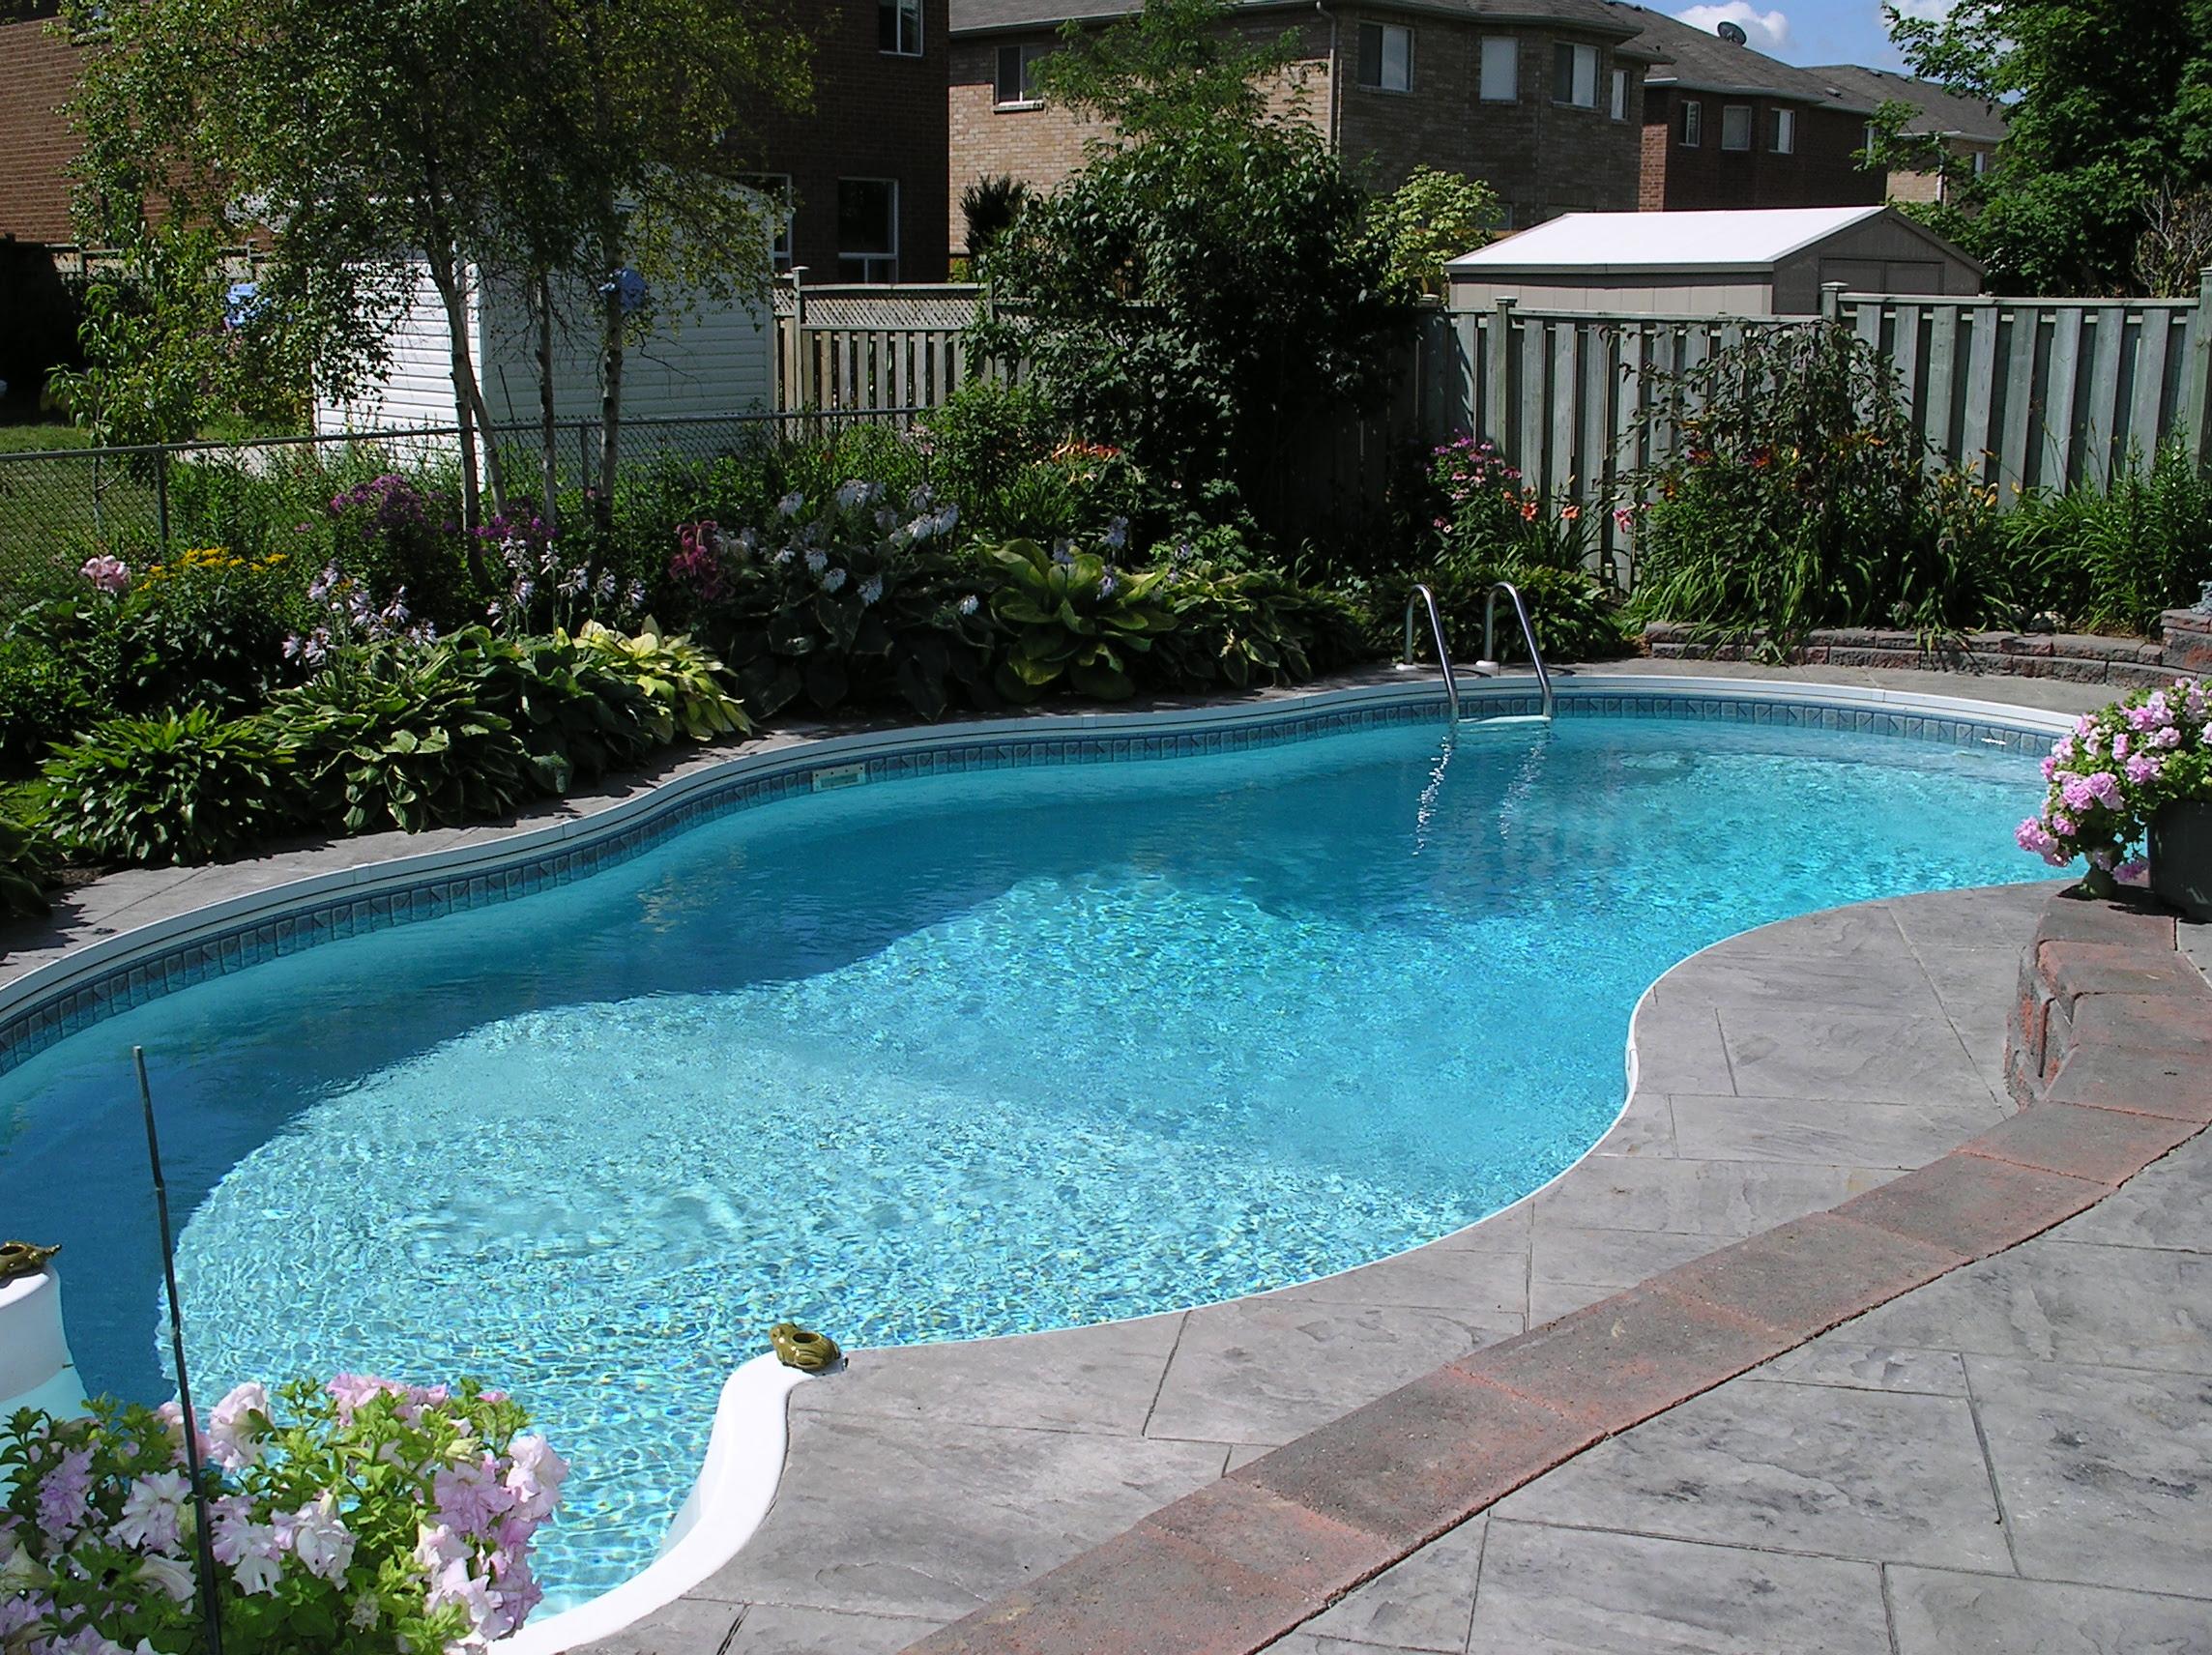 Swimming pool - Wikipedia, the free encyclopedia